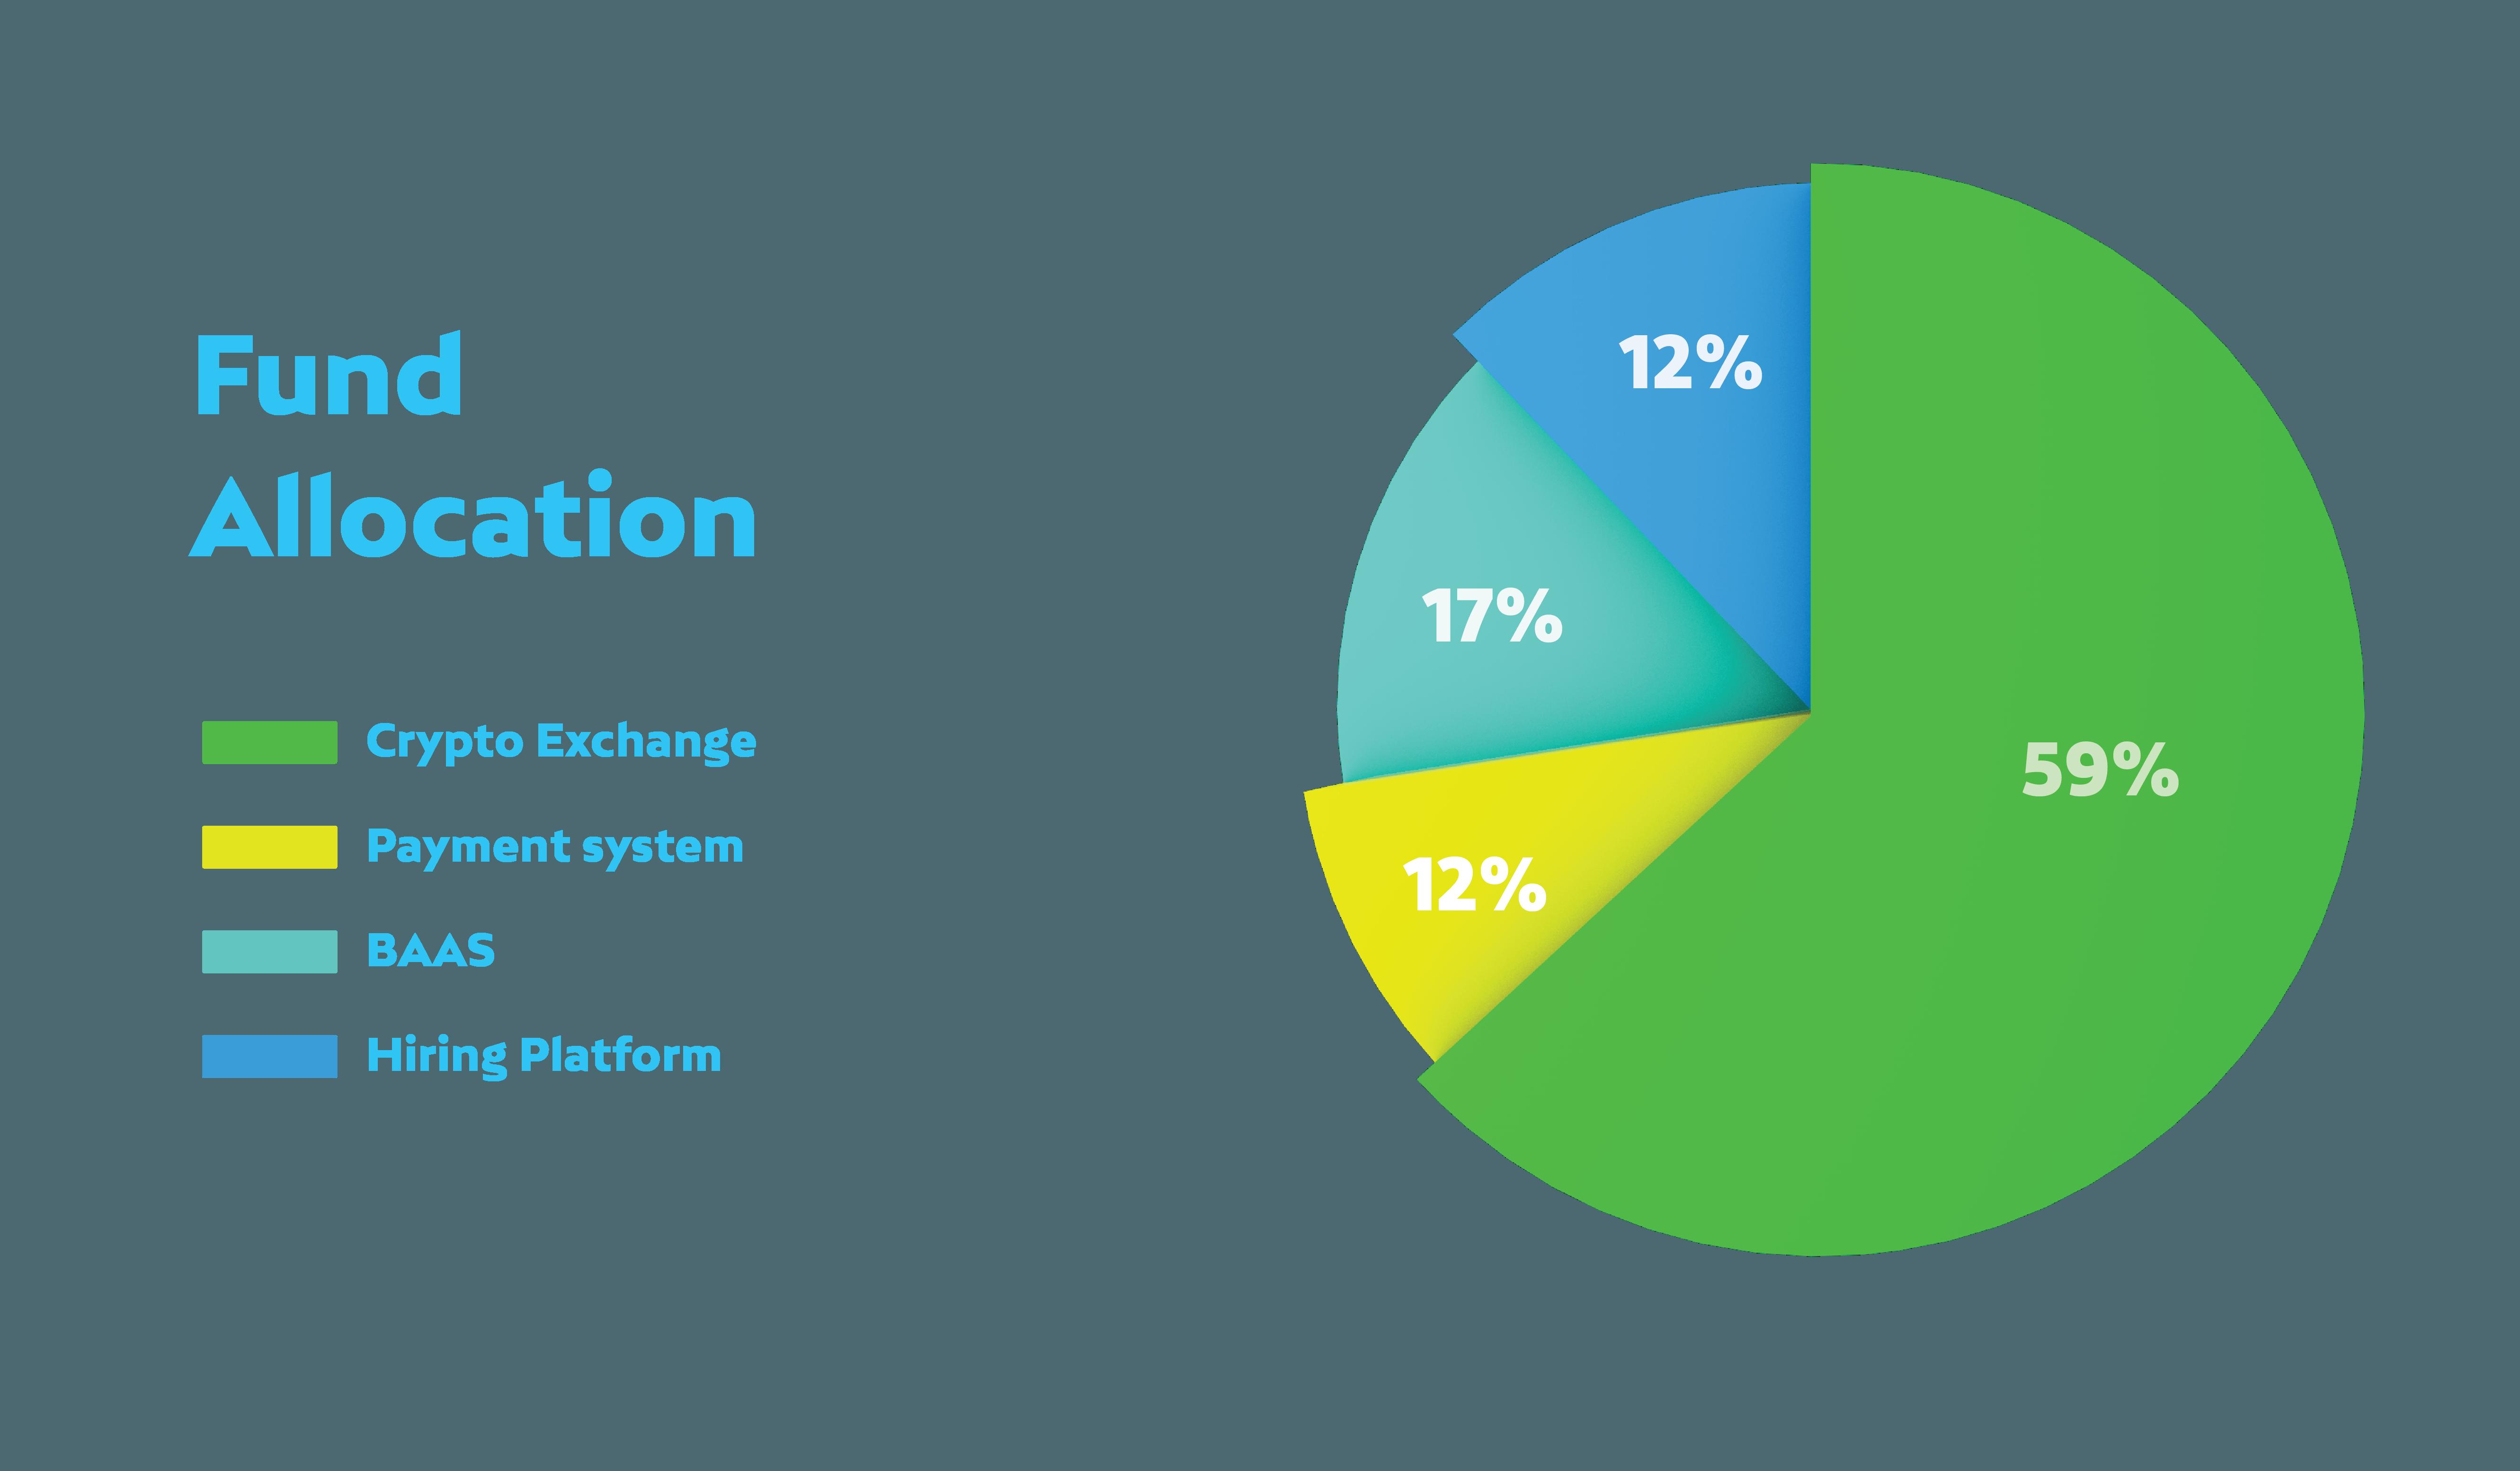 Stakinglab Fund Allocation